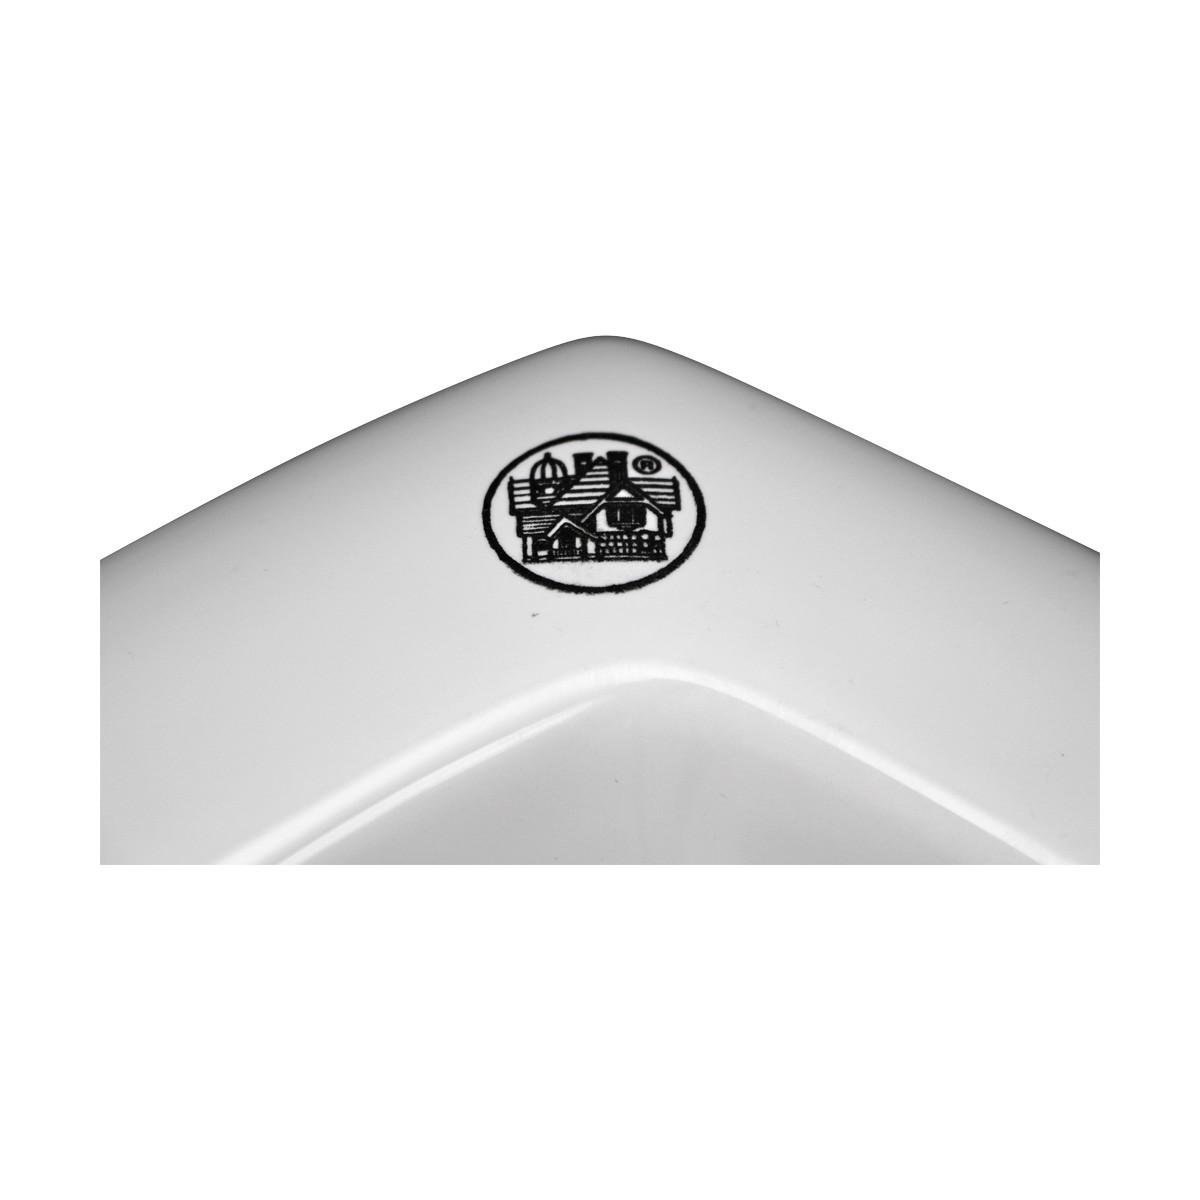 White Above Counter Bathroom Vessel Sink bathroom vessel sinks Countertop vessel sink Bathroom Vessel Sink